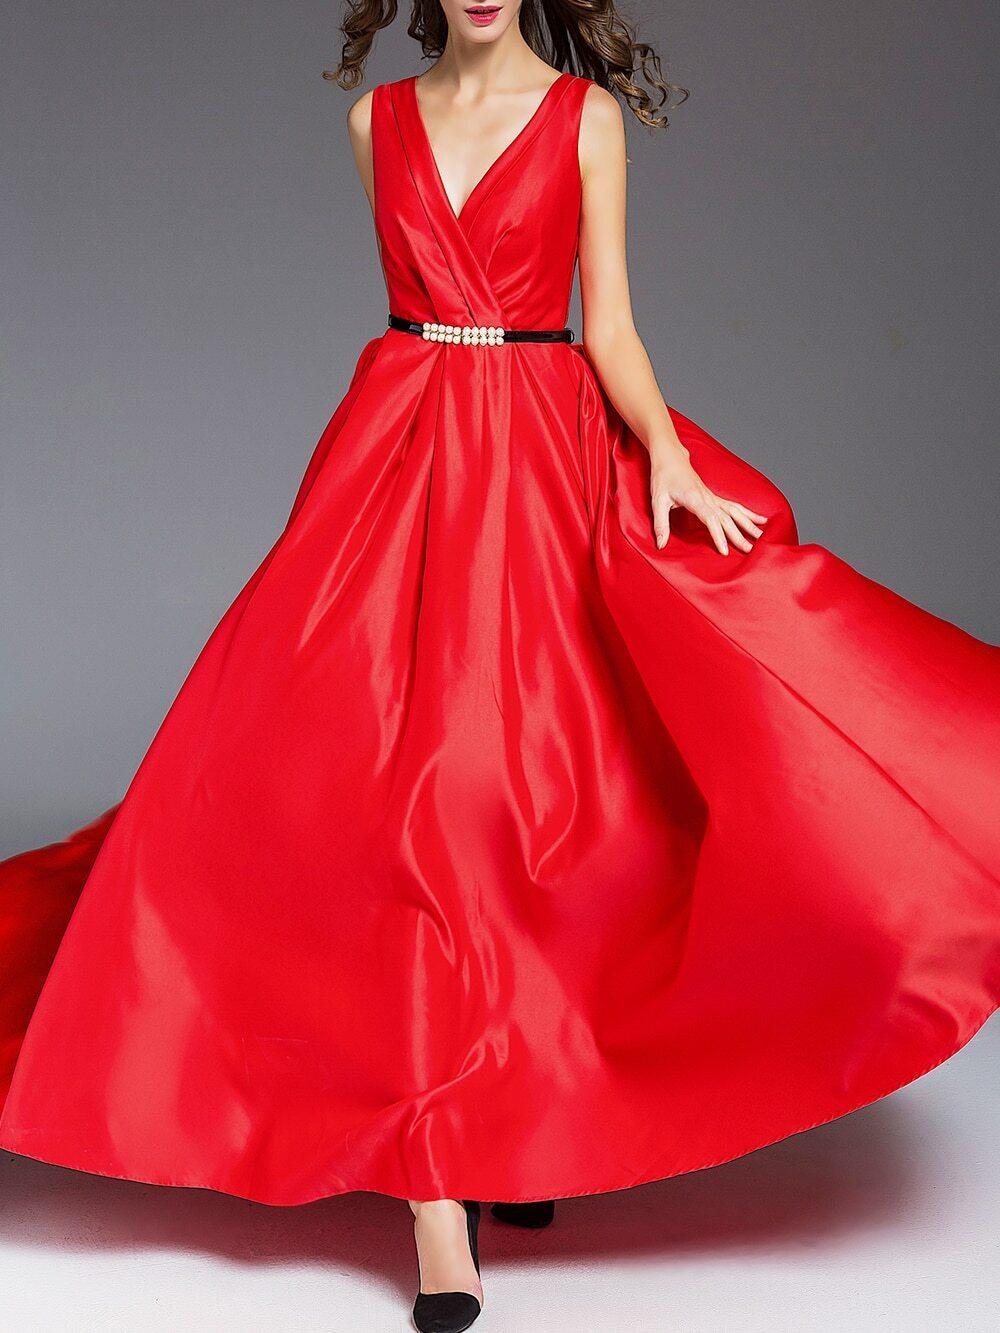 Robe longue col v dos nu avec ceinture rouge french romwe for Interieur paupiere inferieure rouge